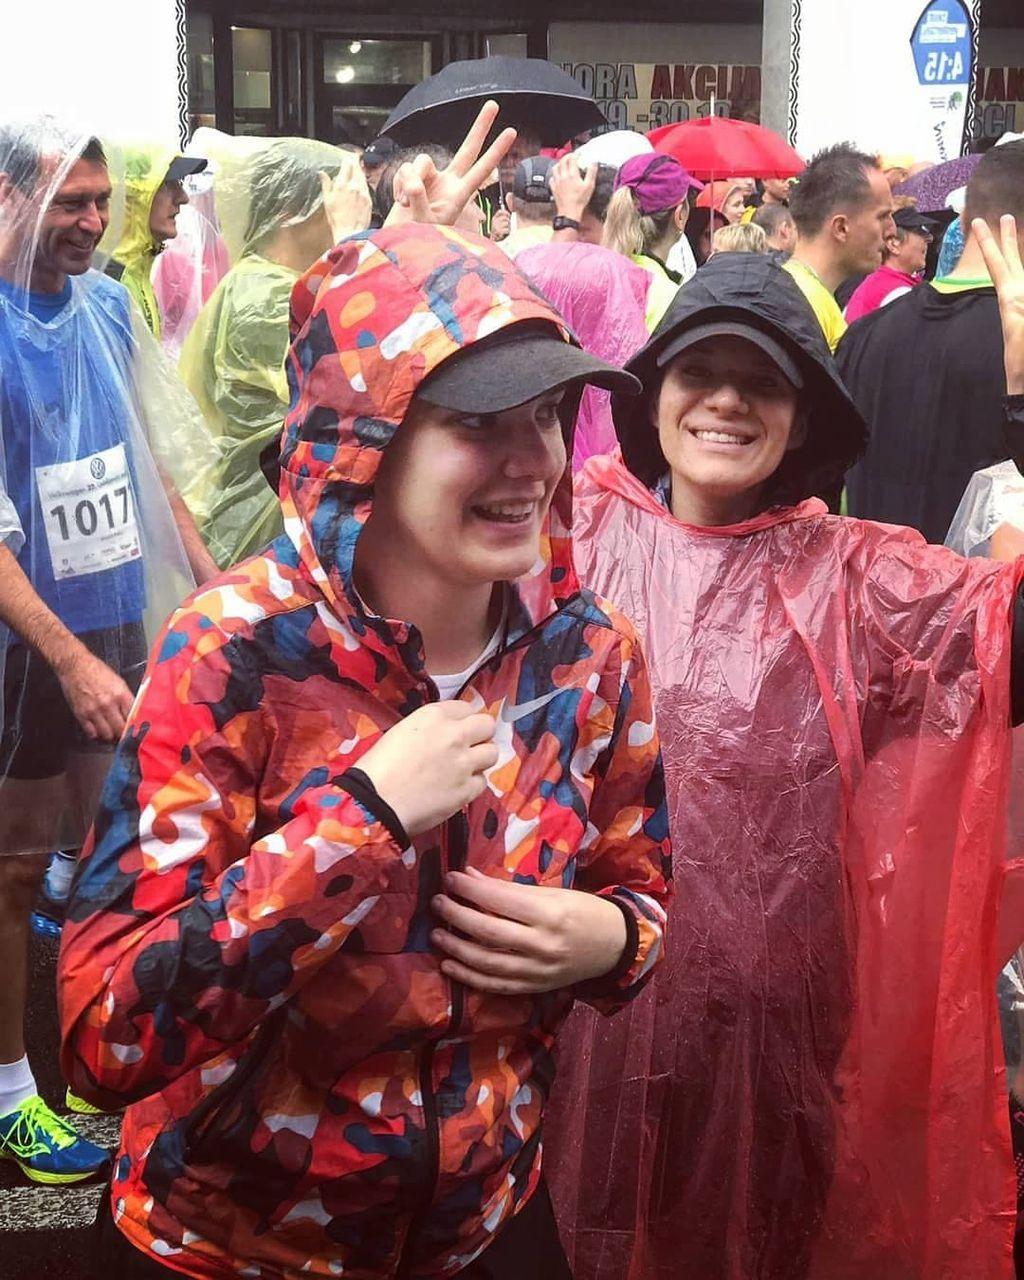 Prvi polumaraton istrčala sam s 31 godinom i s MS-om (Foto: Privatni album) - 6